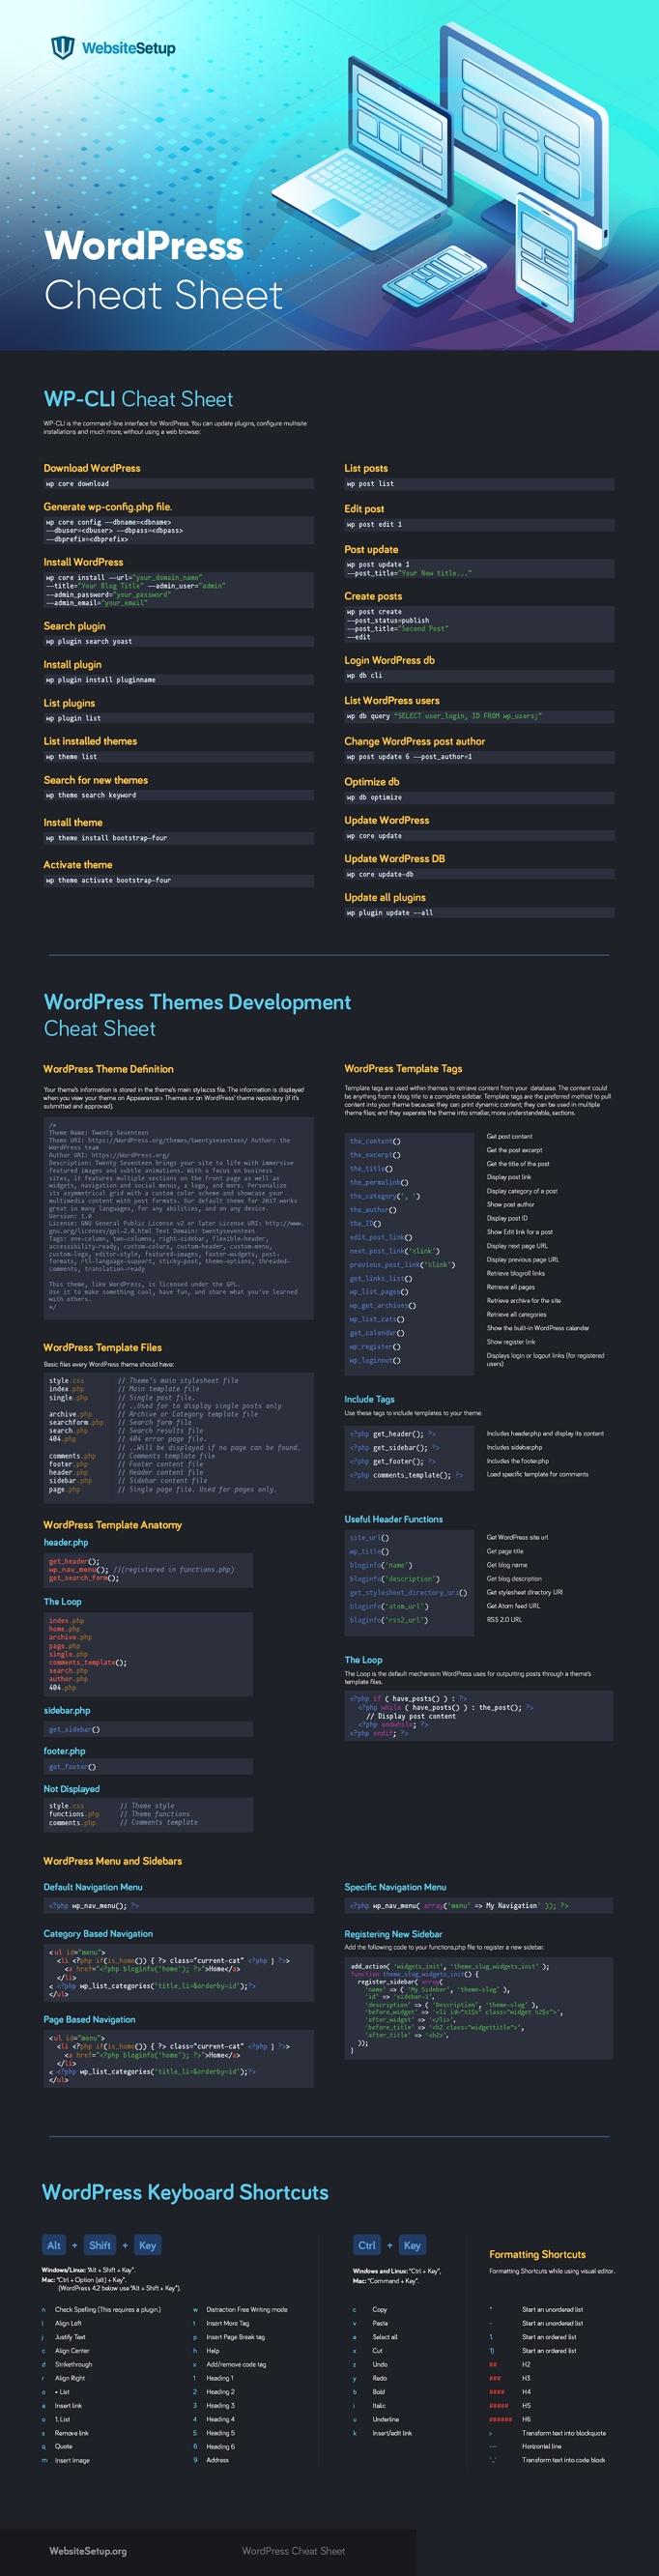 WordPress Cheat Sheet Summary